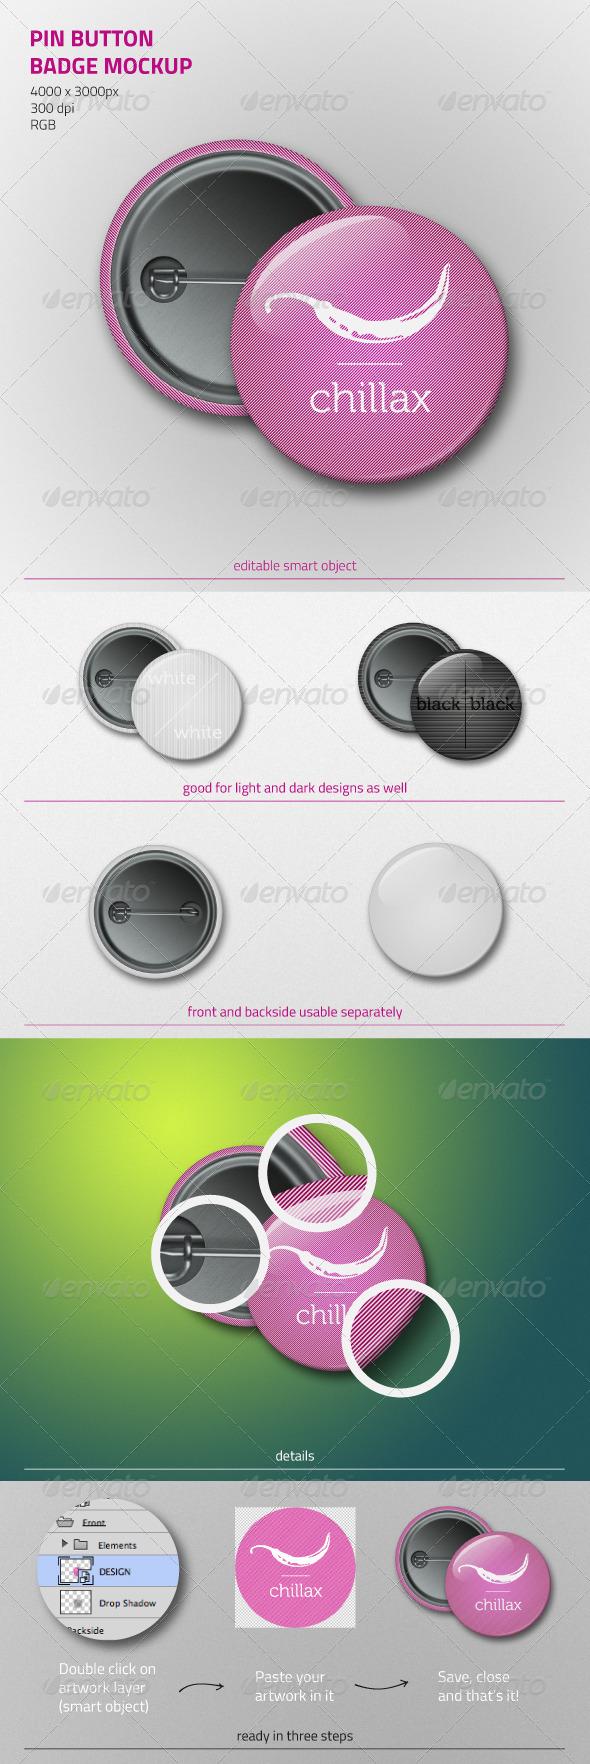 Pin Button Badge Mockup - Miscellaneous Product Mock-Ups